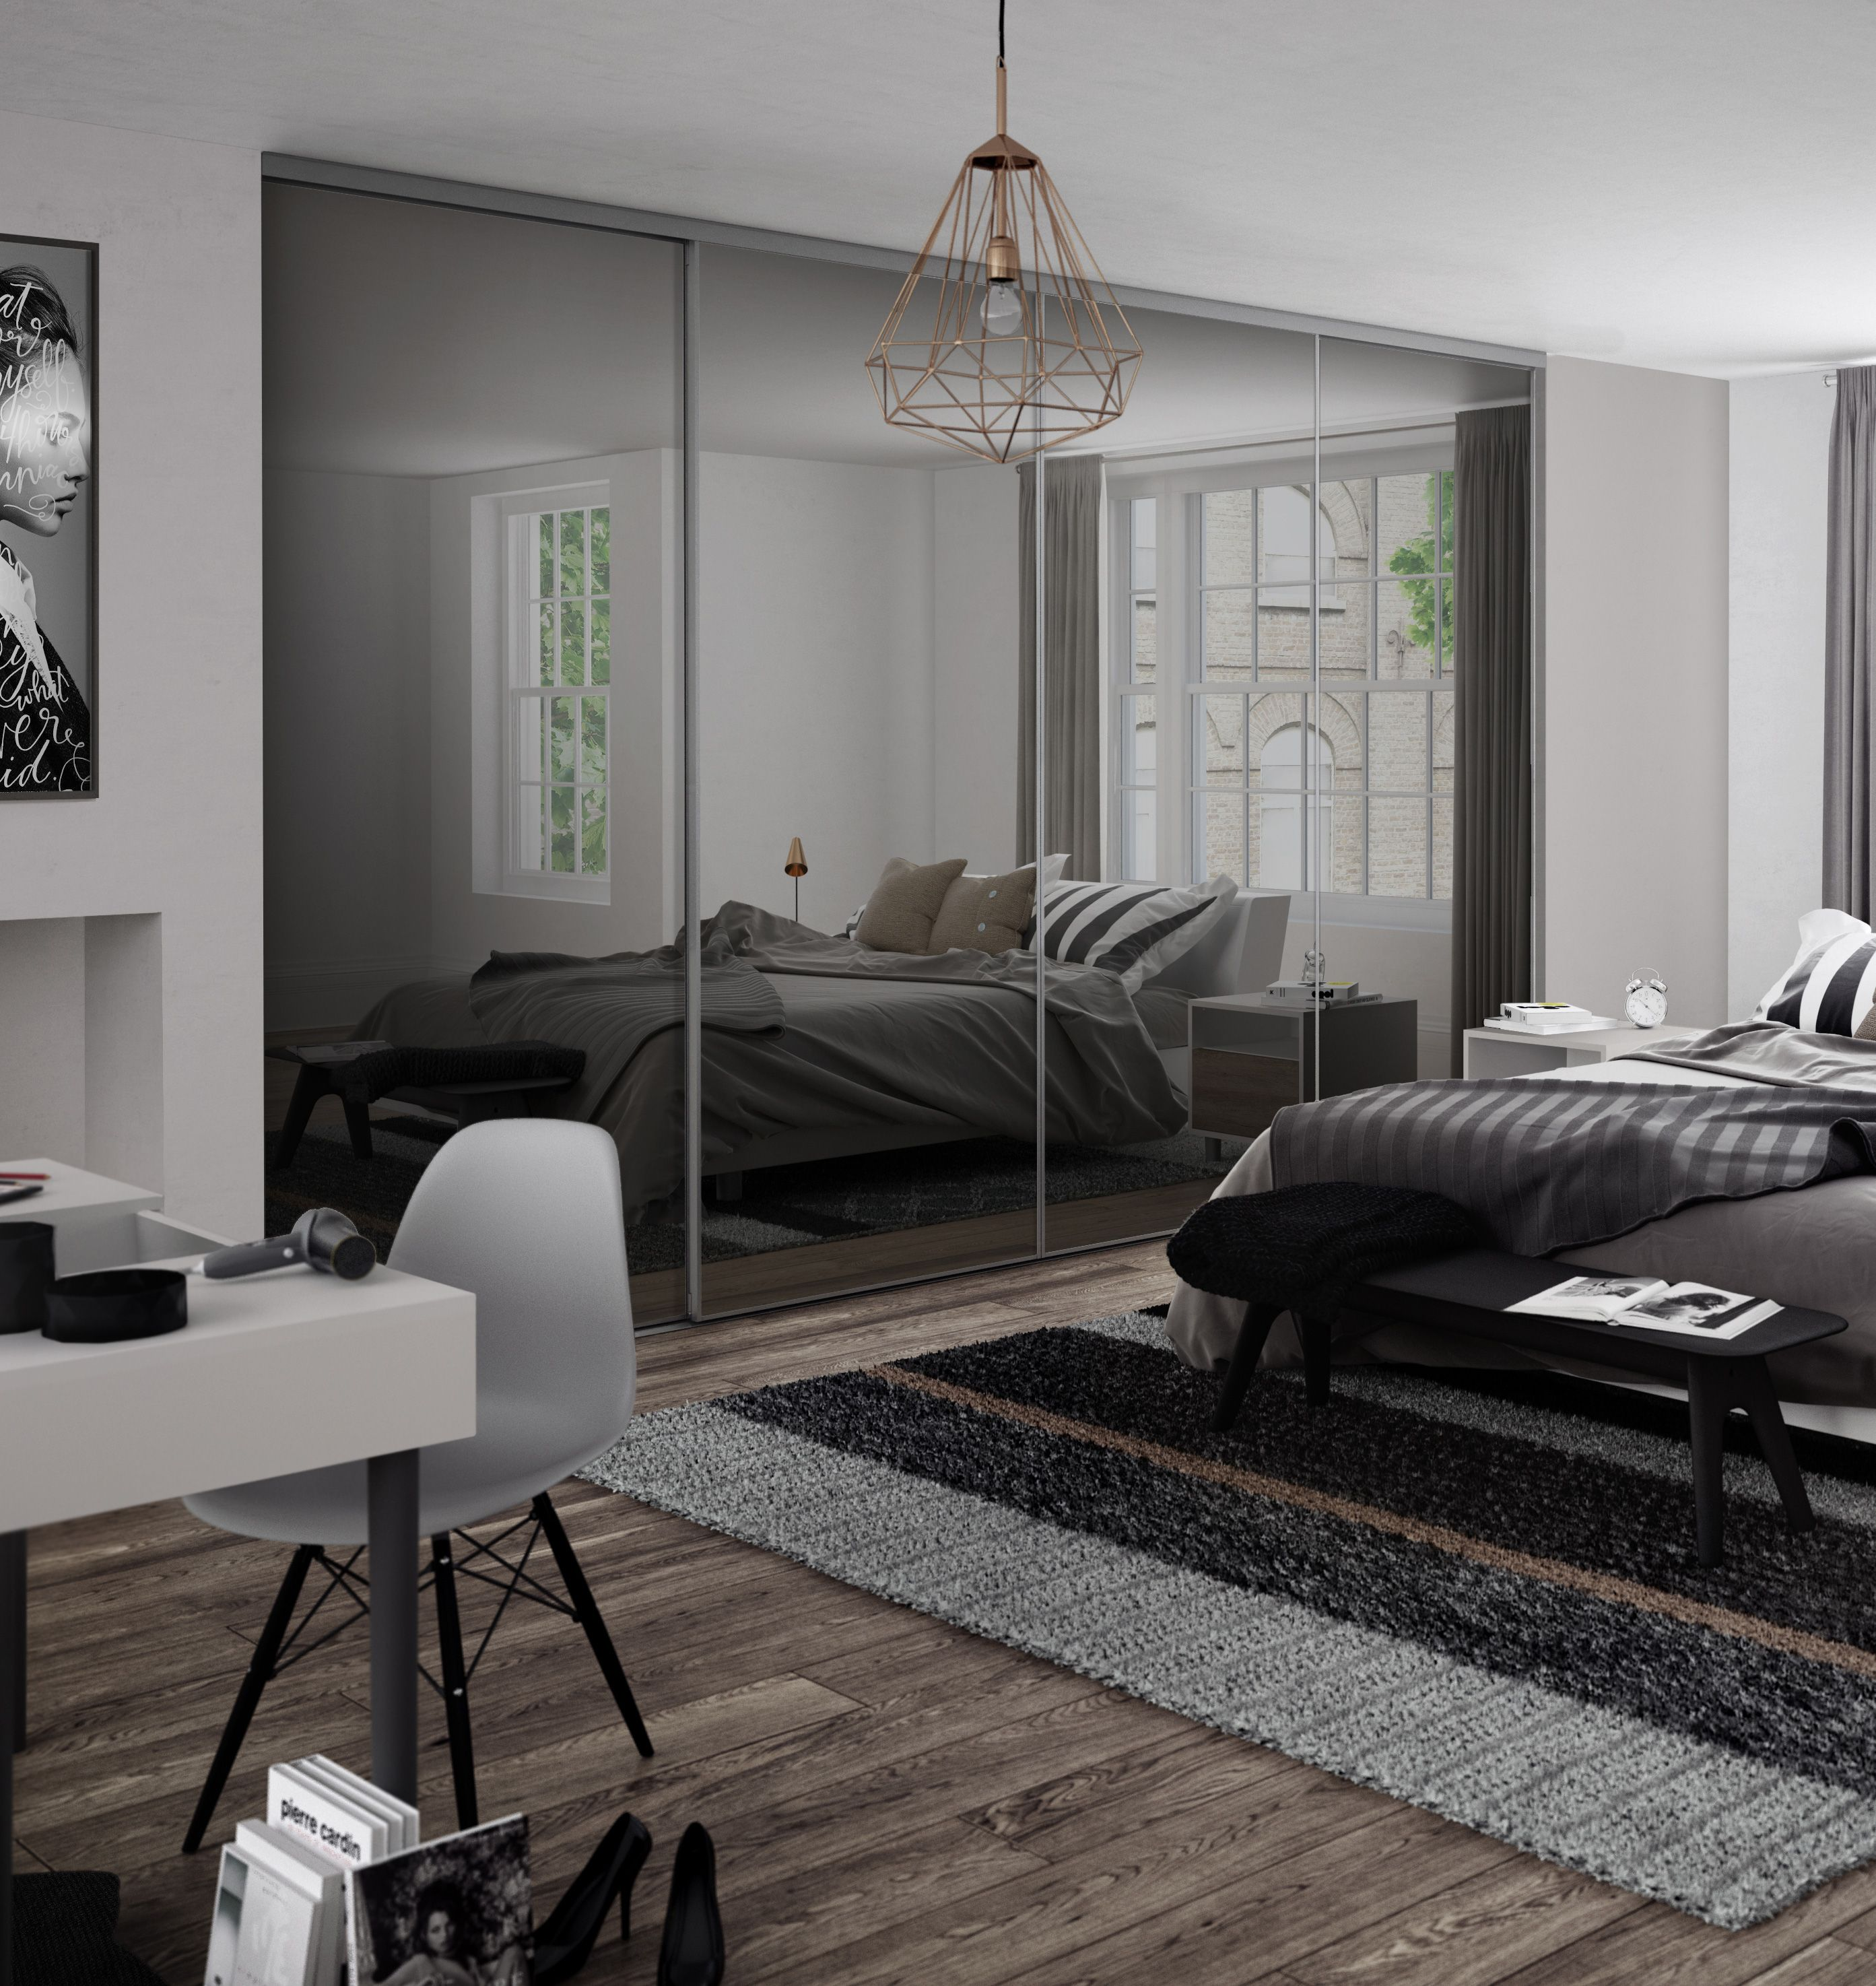 Cheap Bedroom Design Ideas Sliding Door Wardrobes: Ultra-sleek And Delightfully Contemporary: Premium Mini